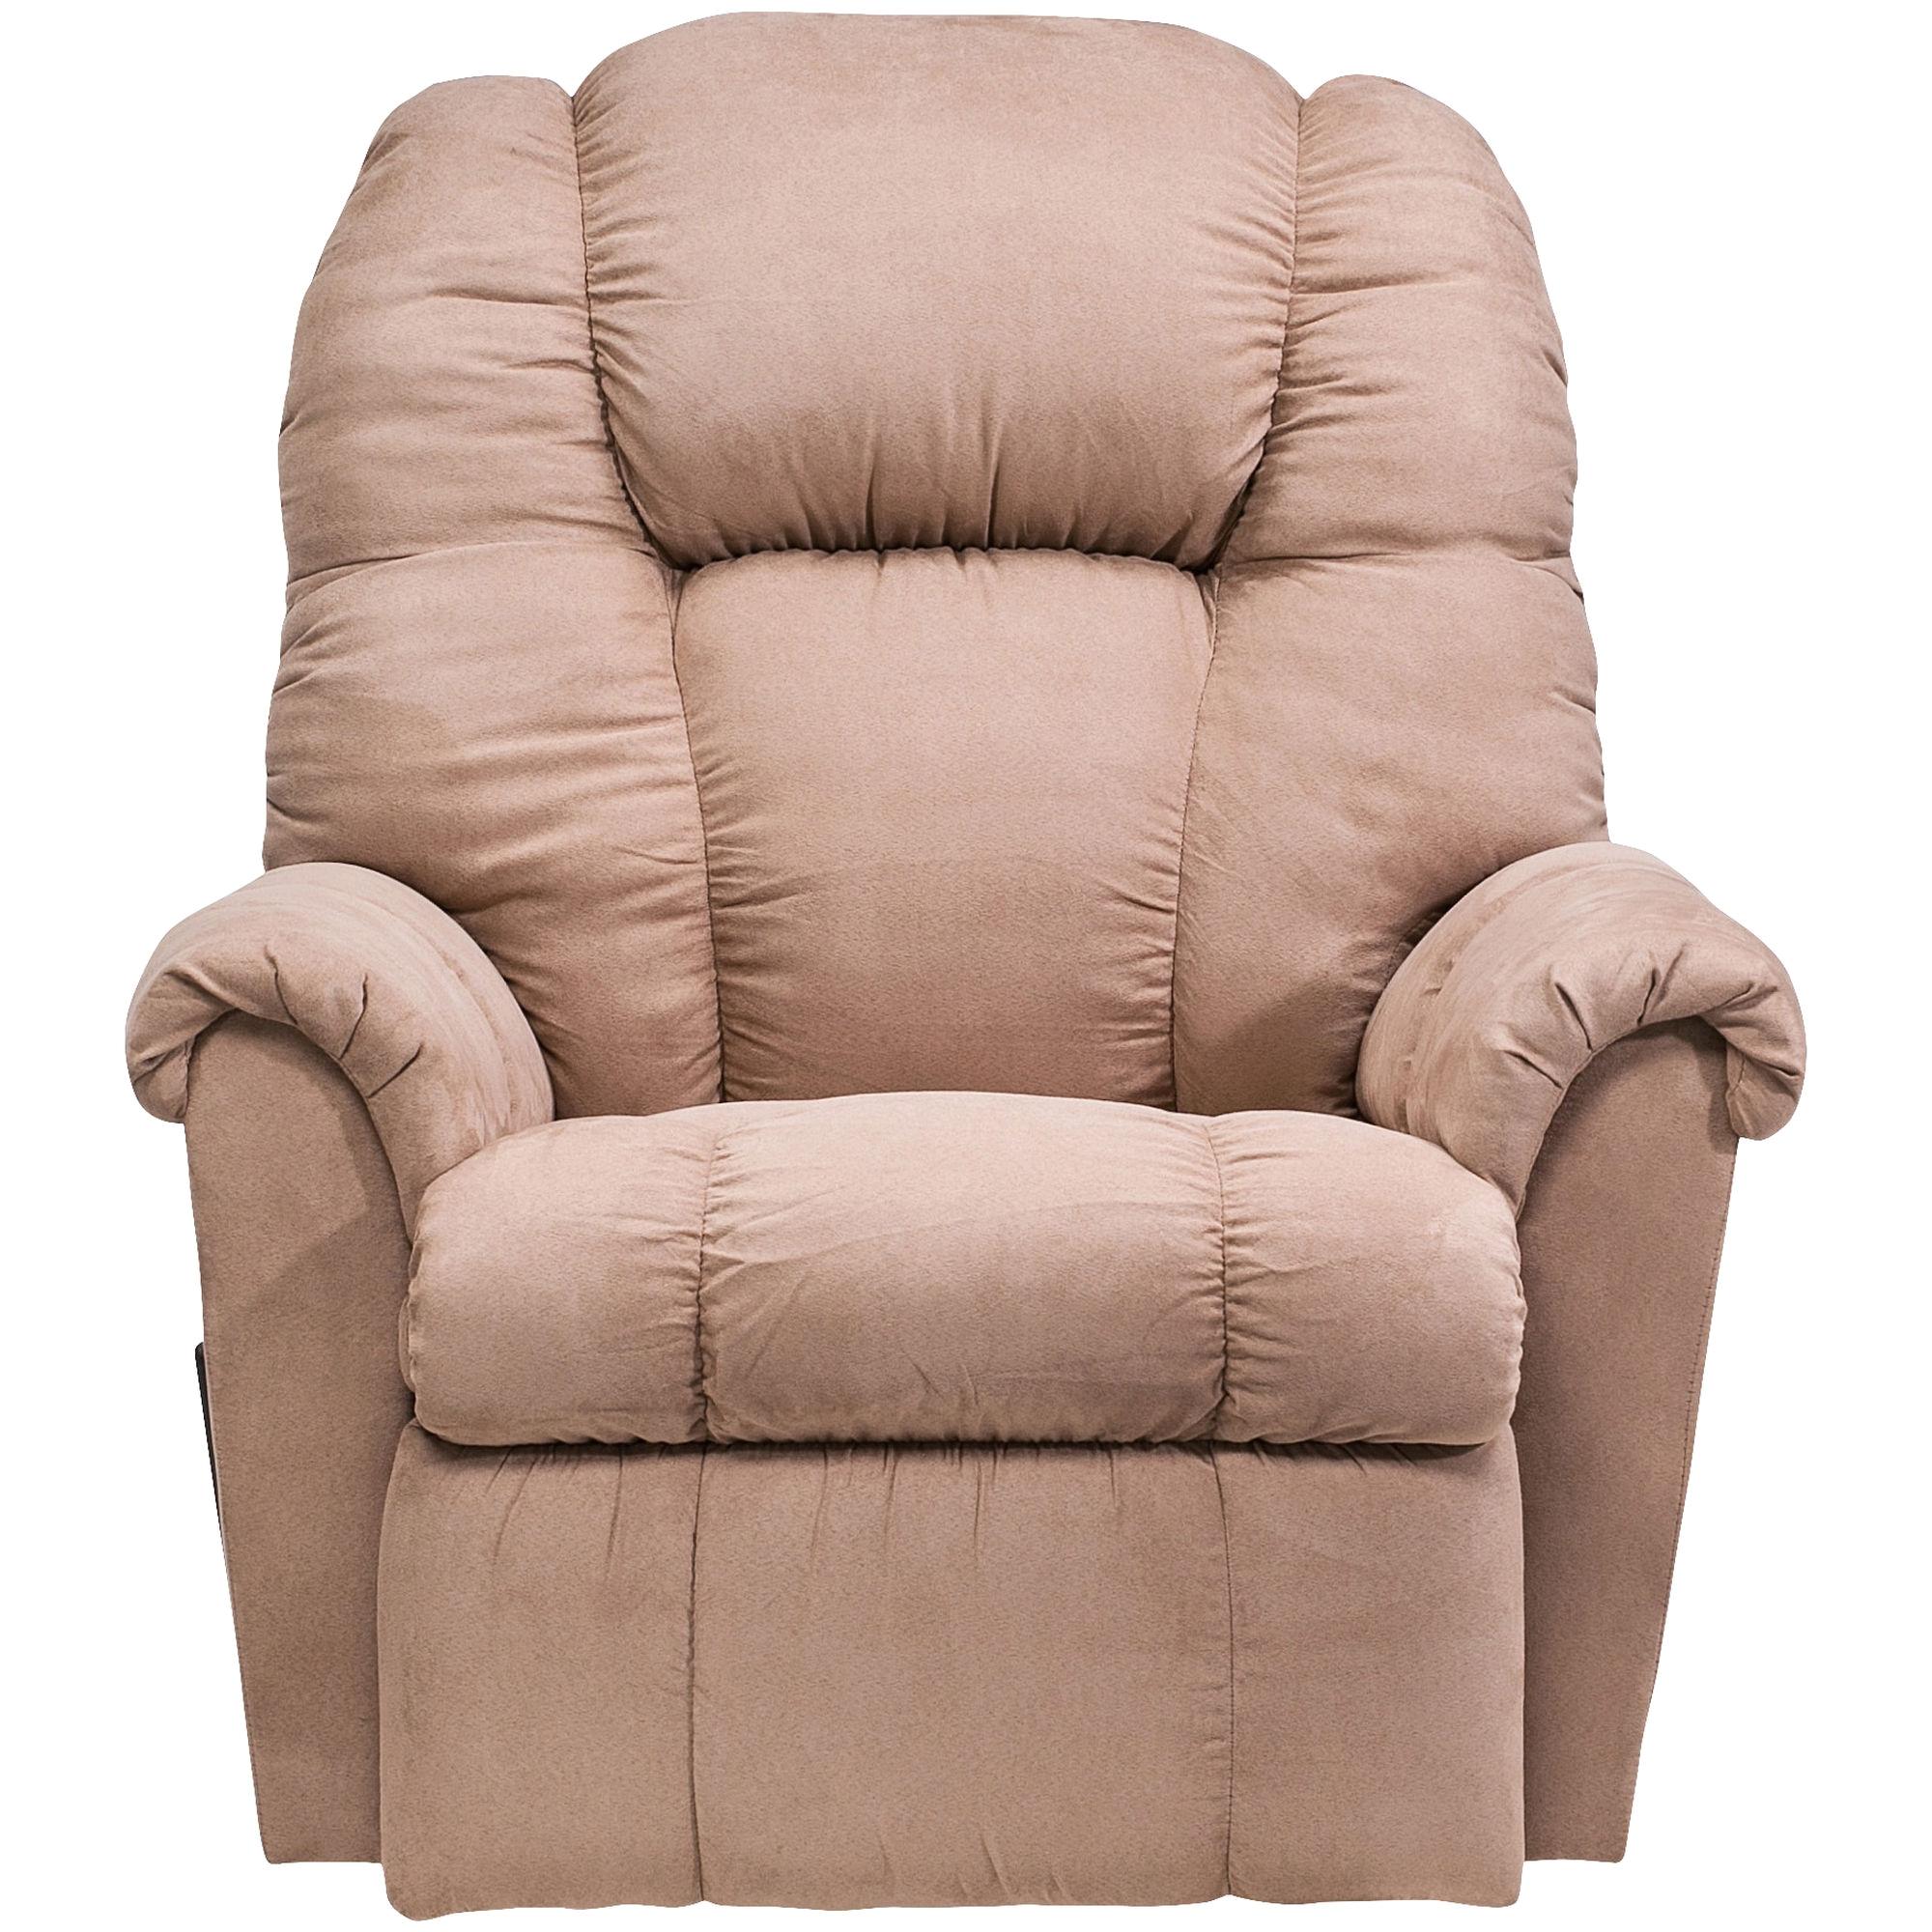 Slumberland Rocking Chairs Slumberland Furniture Draco Mocha Rocker Recliner